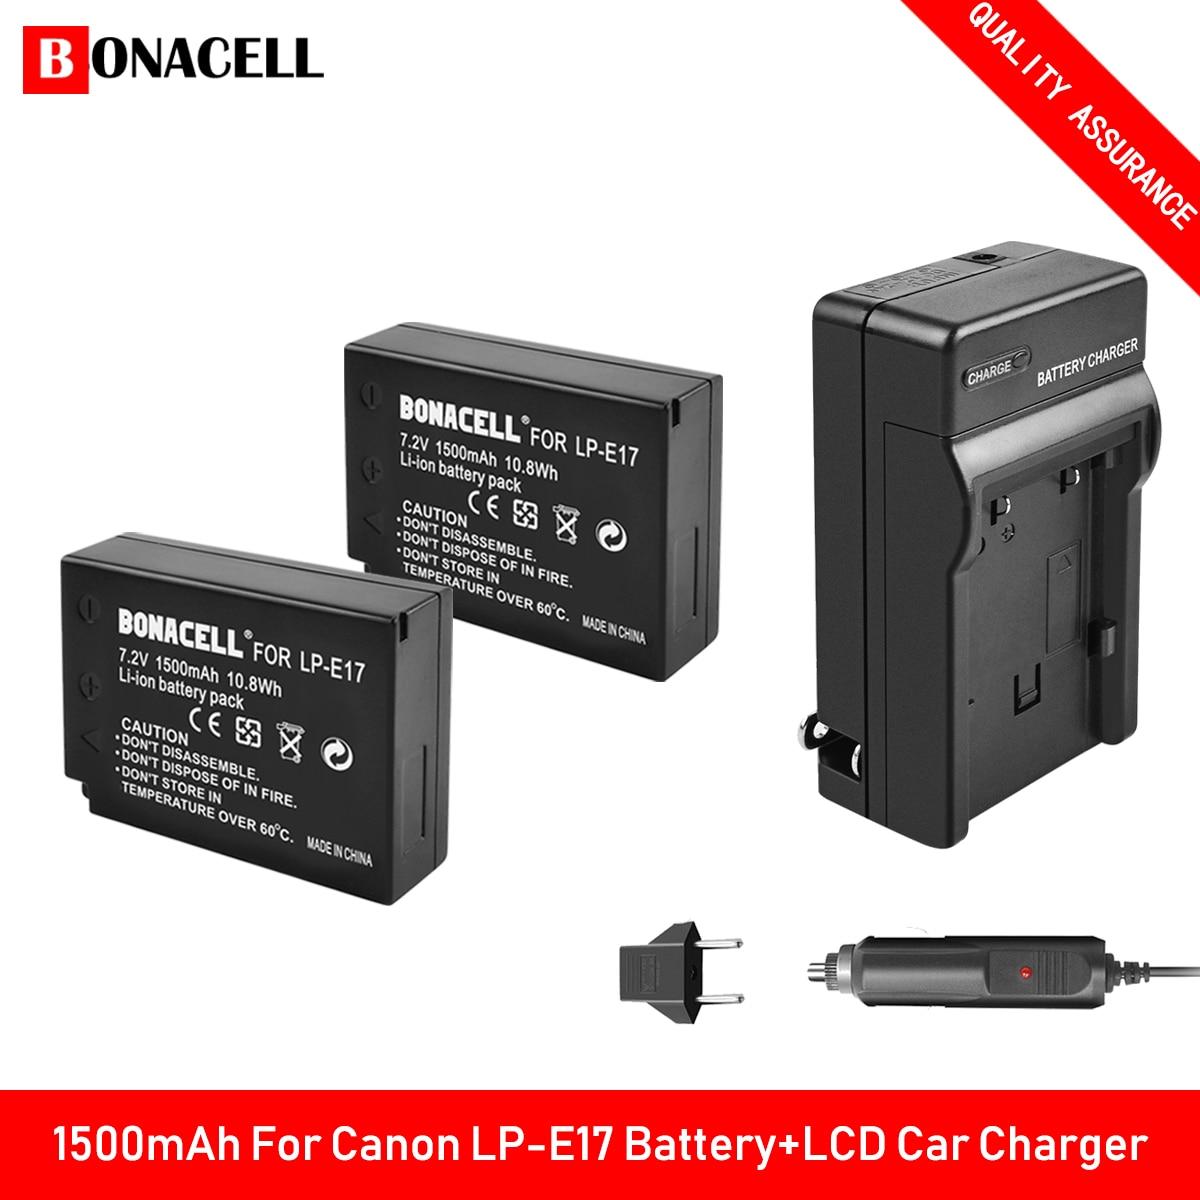 Bonacell LP-E17 LPE17 LP E17 Bateria + Carregador de Carro para Canon Rebel EOS M3 M5 M6 T6i T7i EOS 77D 750D 760D T6i T6s 800D 8000D Z70